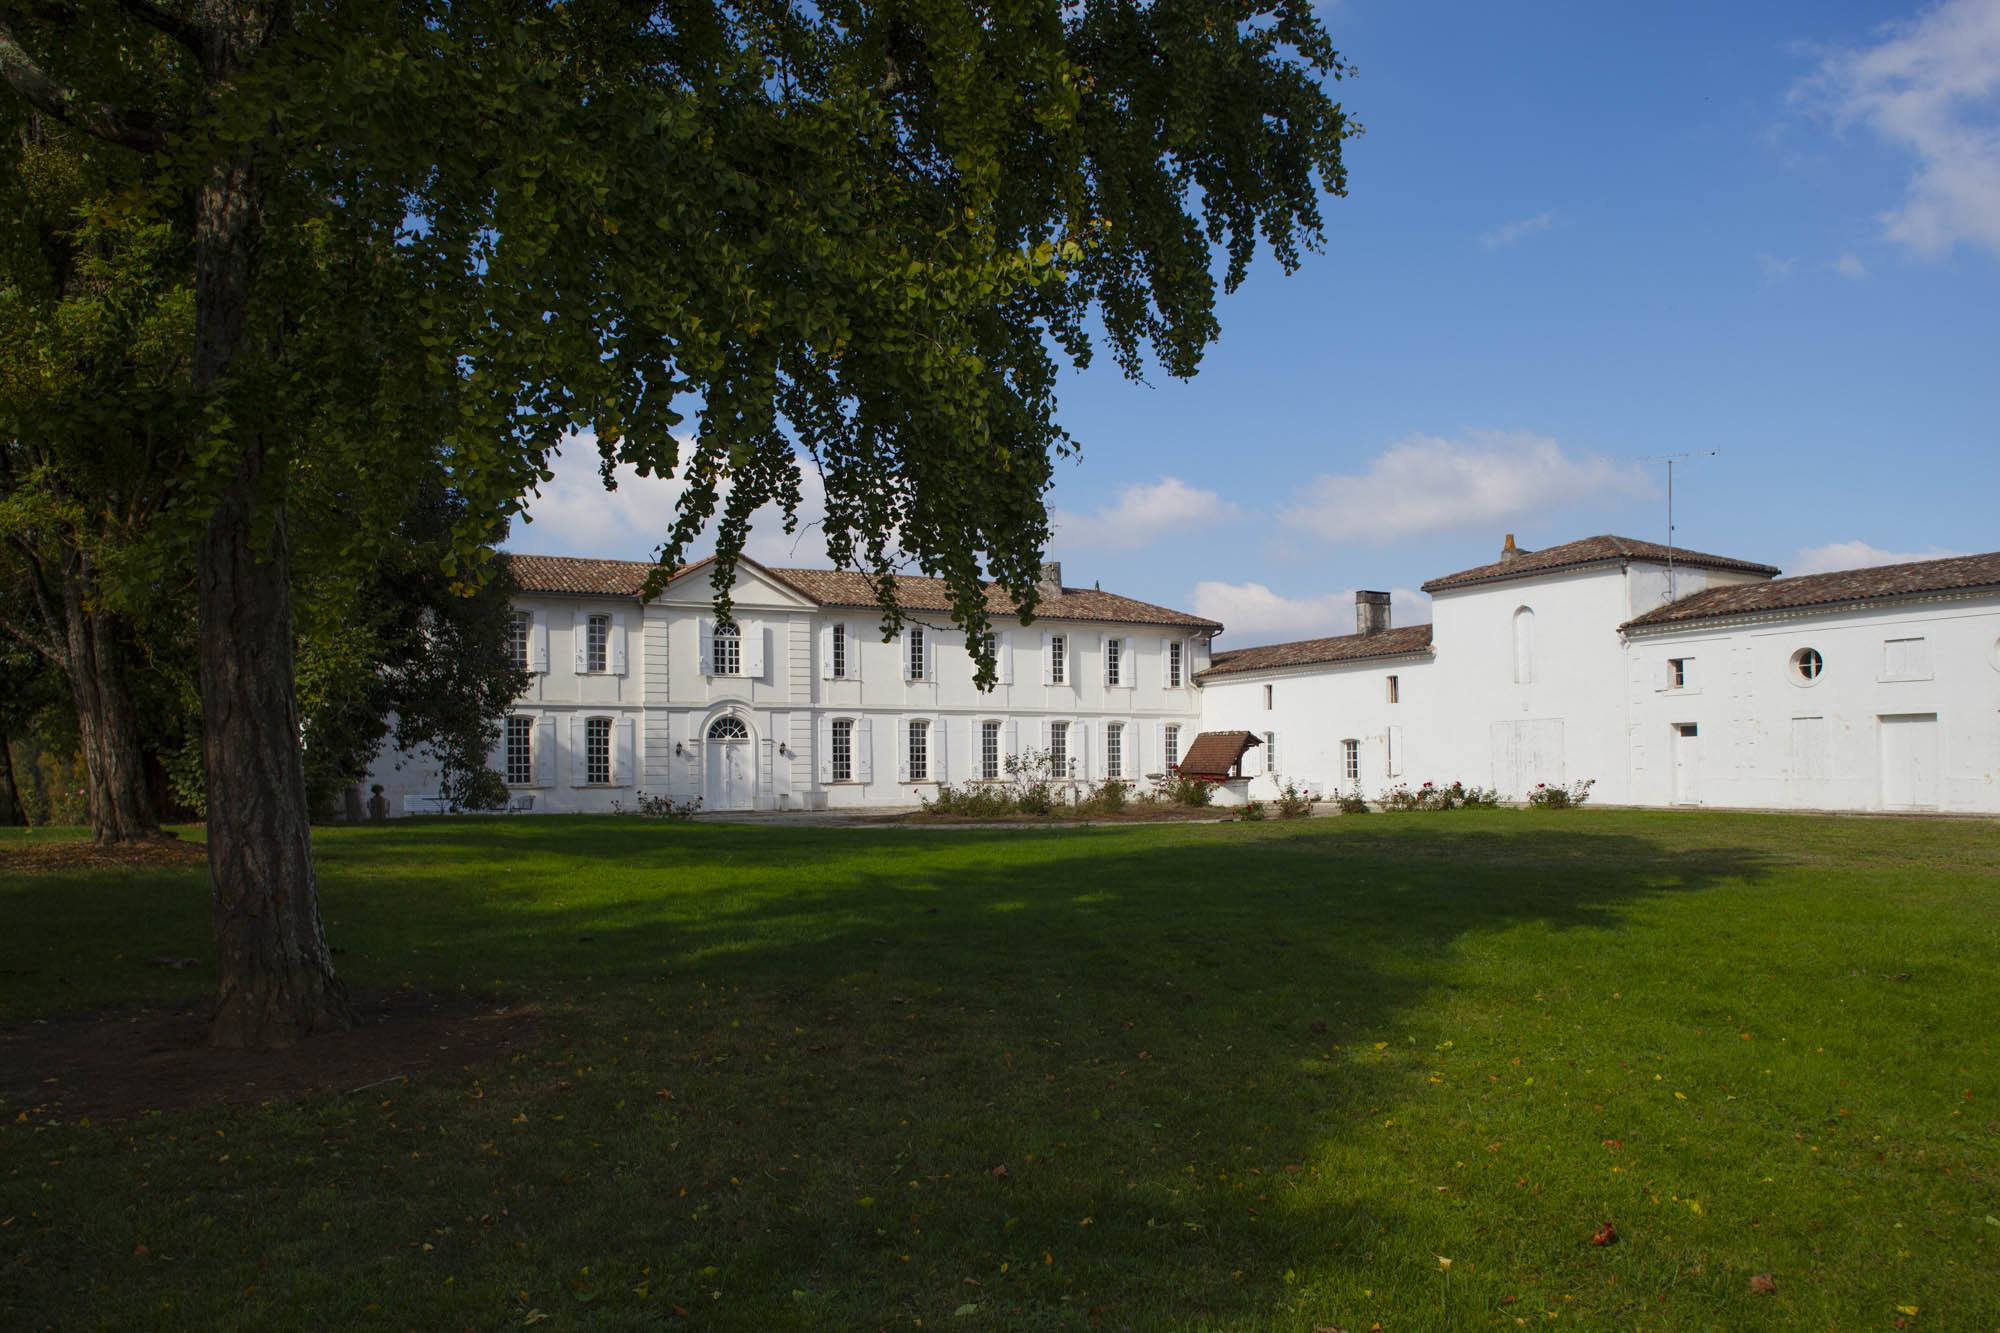 Chateau la clotte 2018